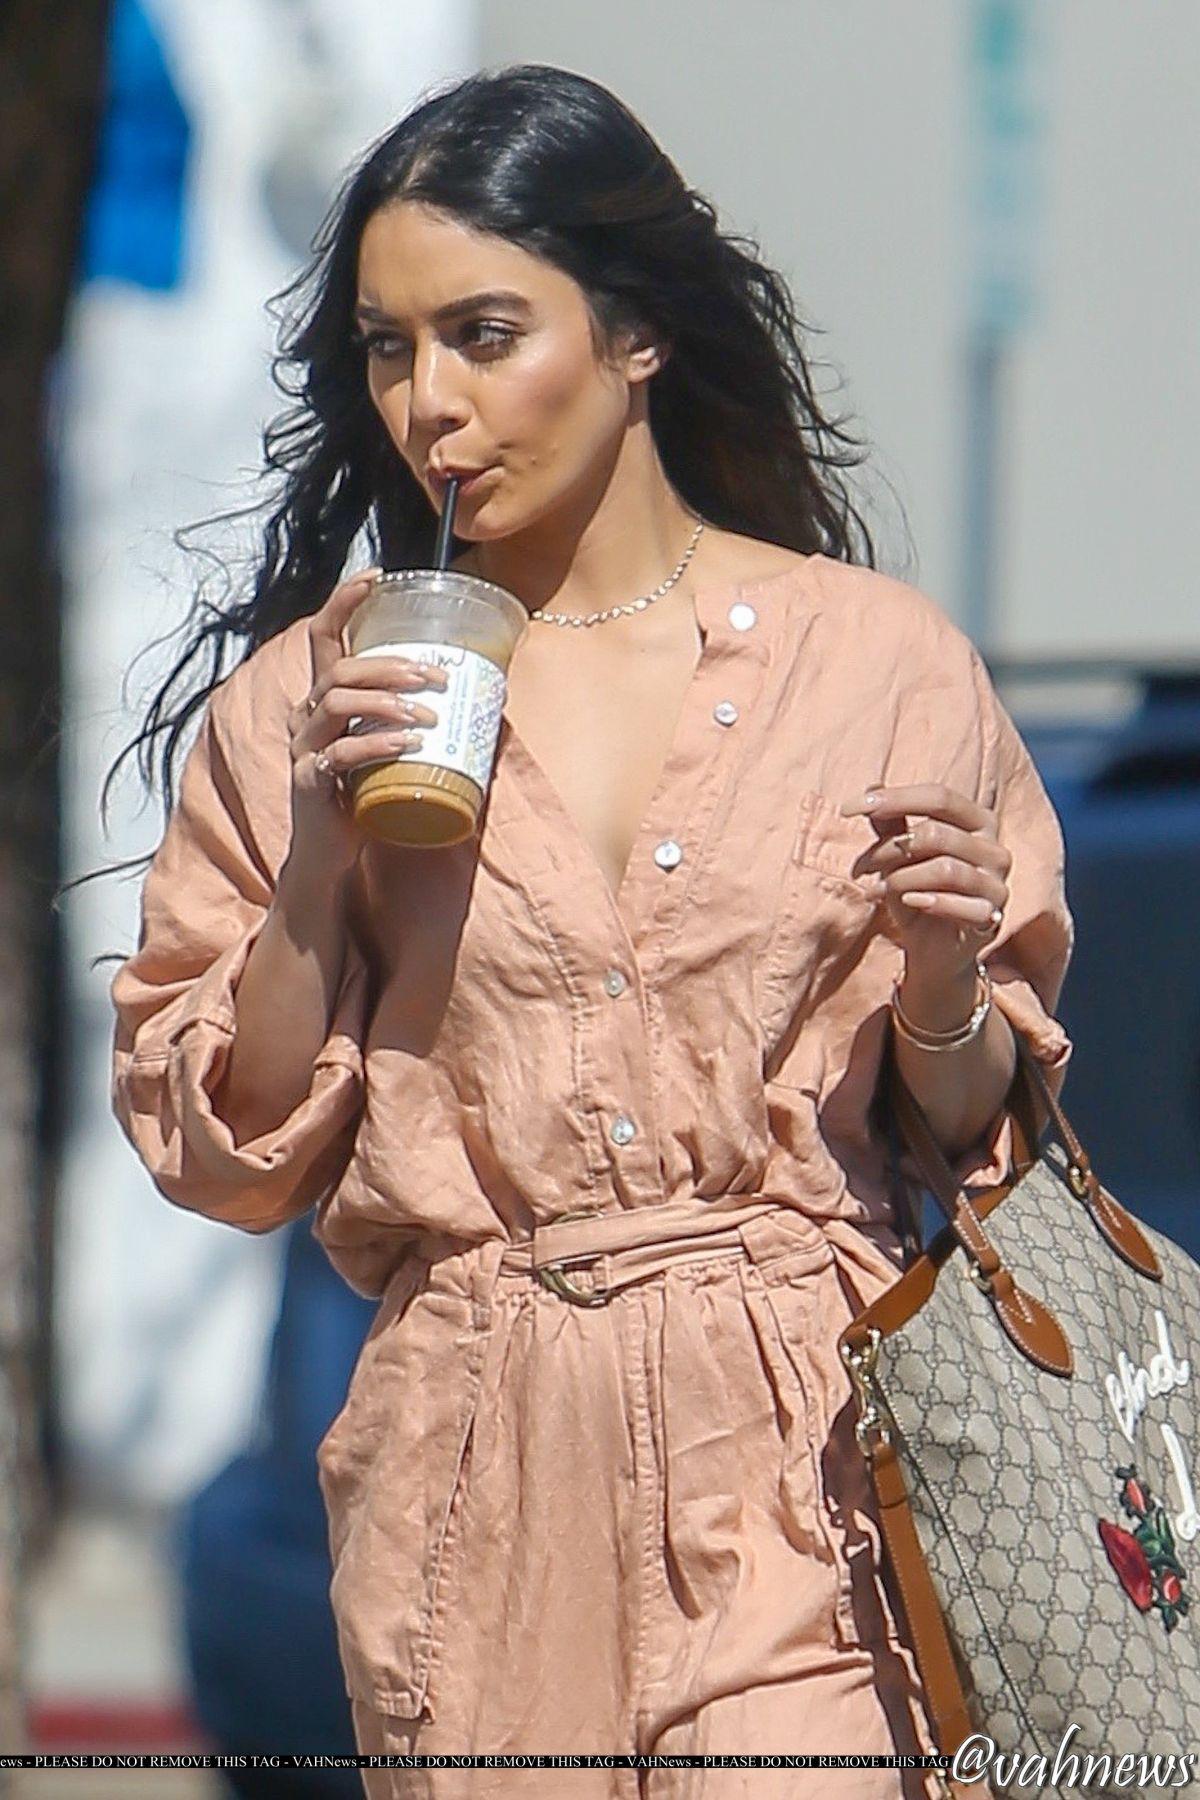 VANESSA HUDGENS at Alfred JKitchen in Los Angeles 03/24/2017